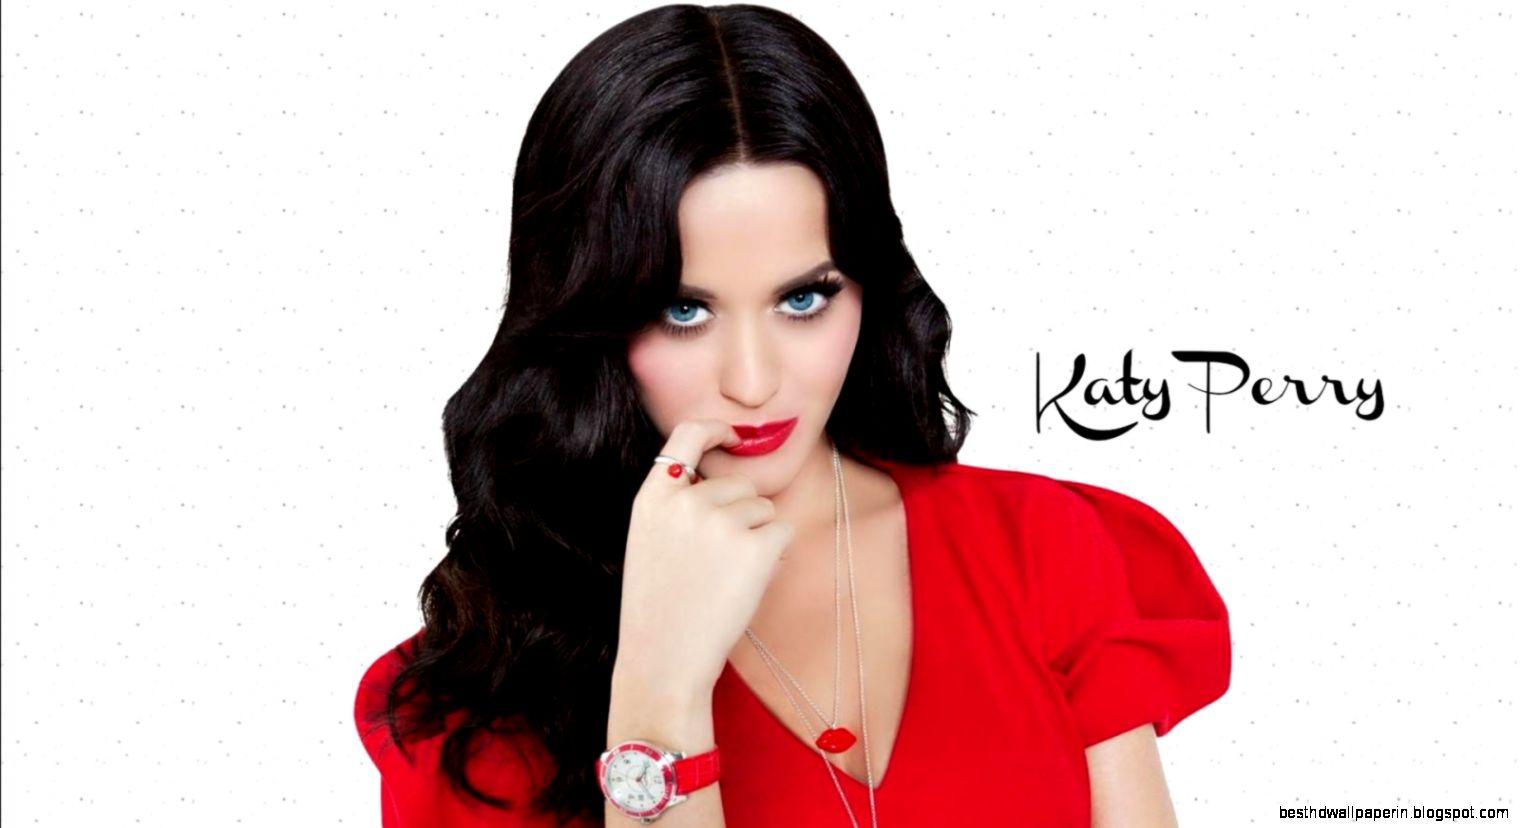 katy perry beauty singer - photo #35